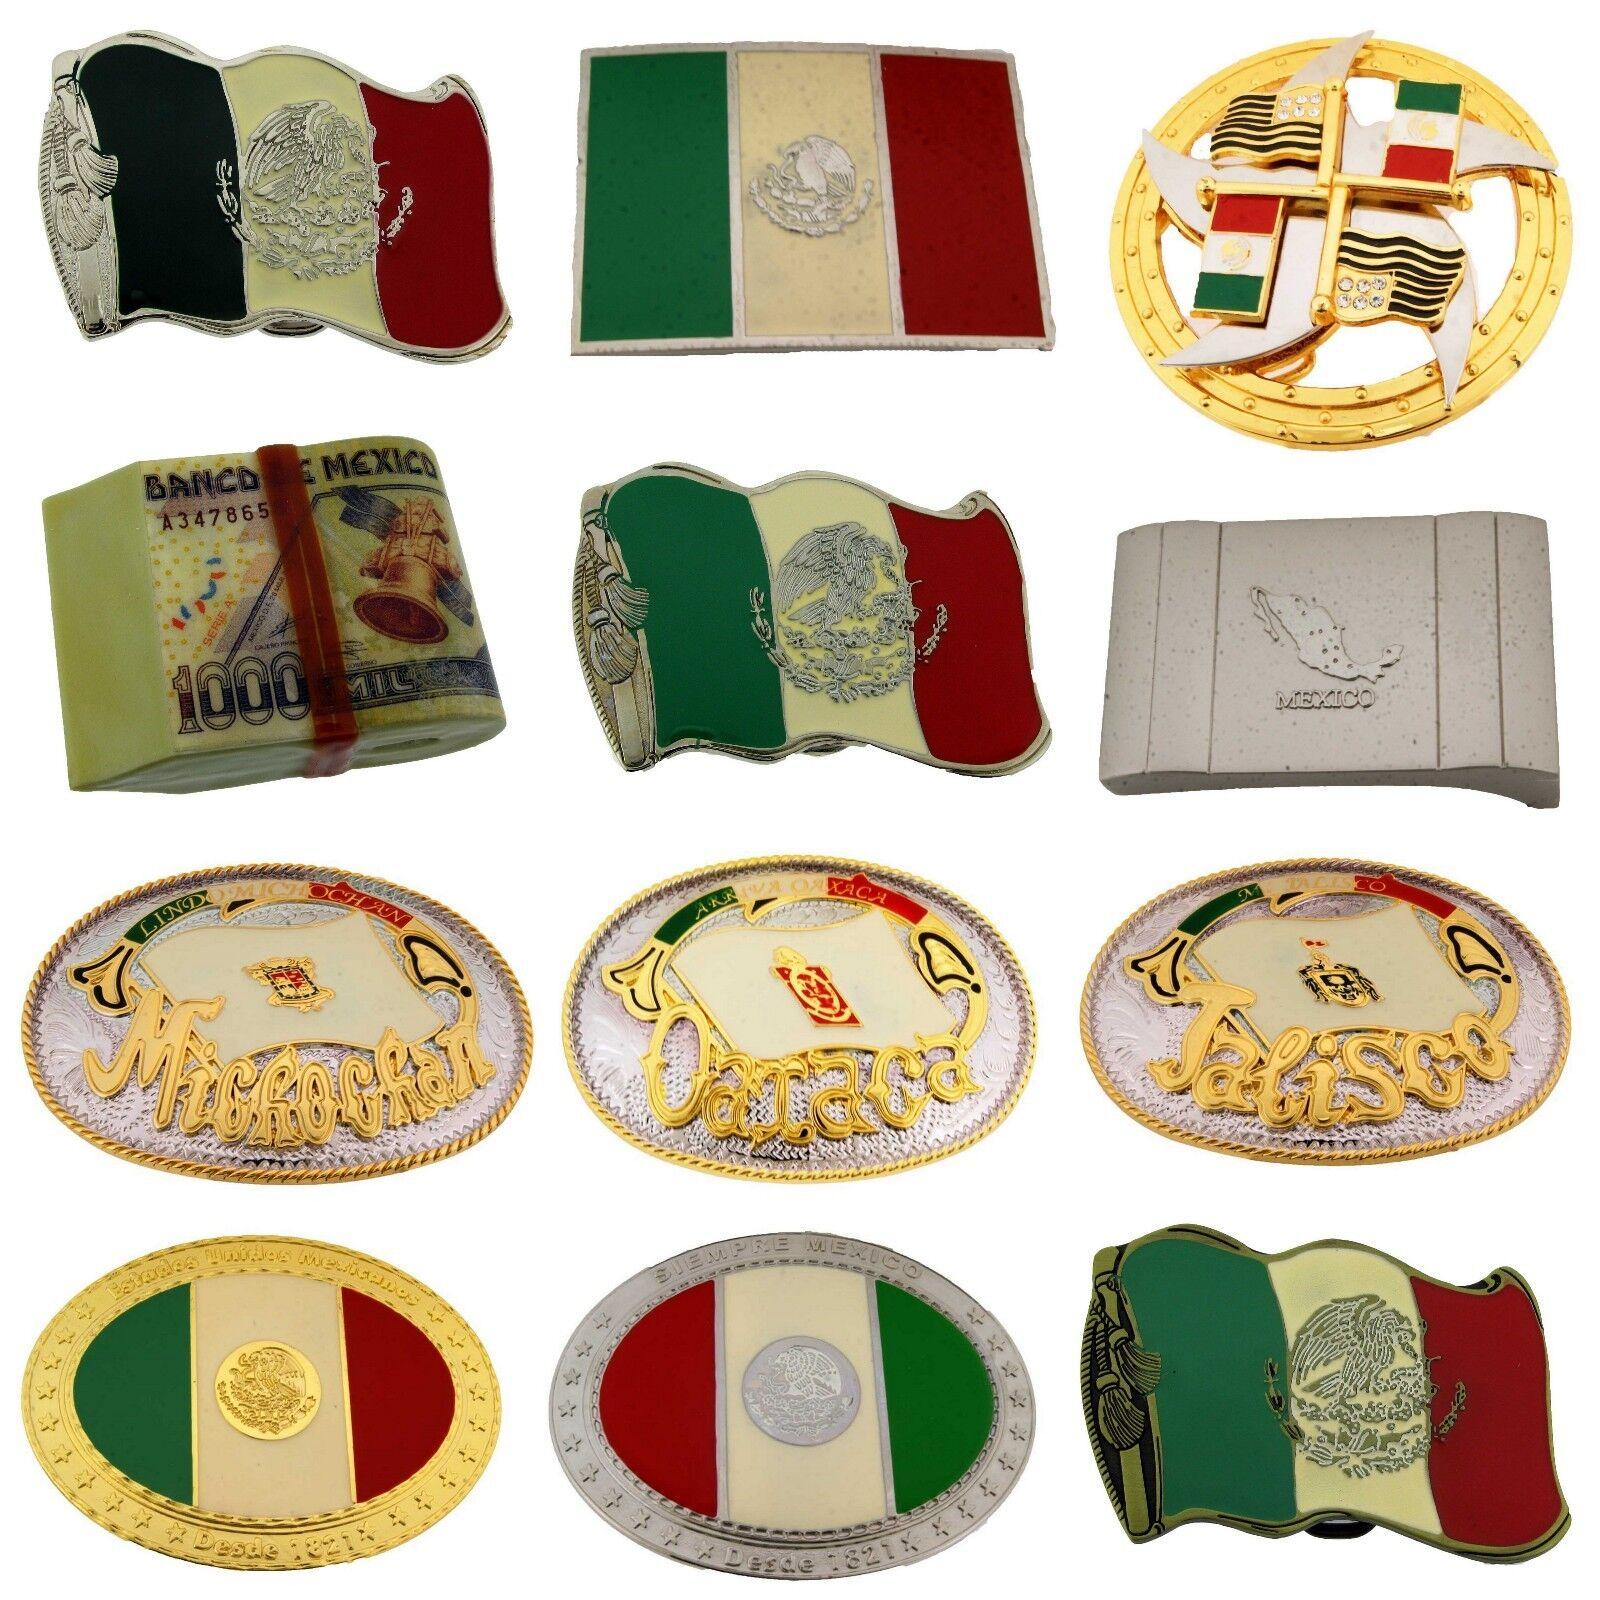 12 Stück Großhandel Mexico Flagge Gürtelschnalle Mexikaner Texan Western Vaquero